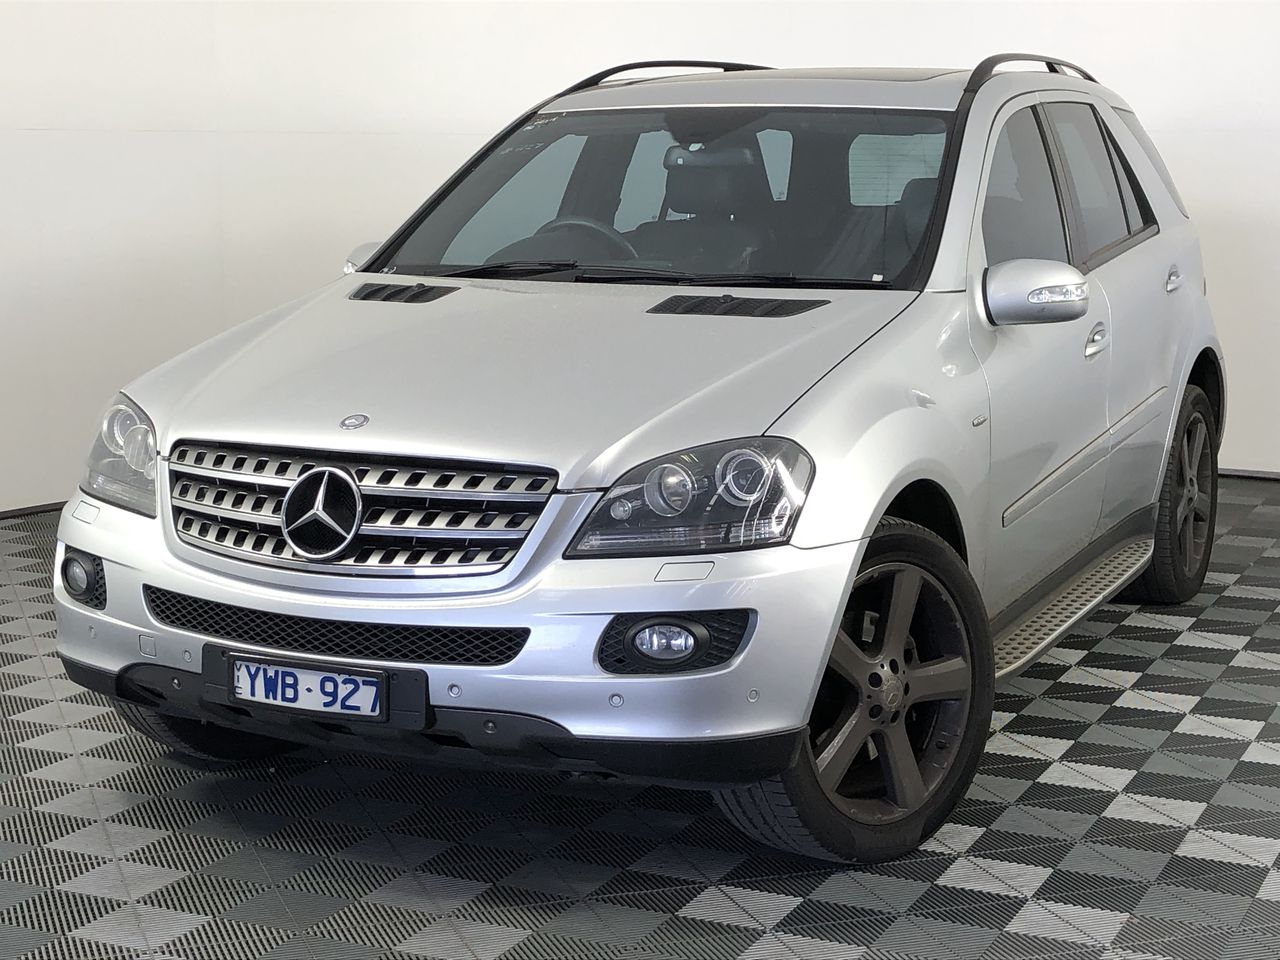 2008 Mercedes Benz ML 350 (4x4) W164 Automatic Wagon